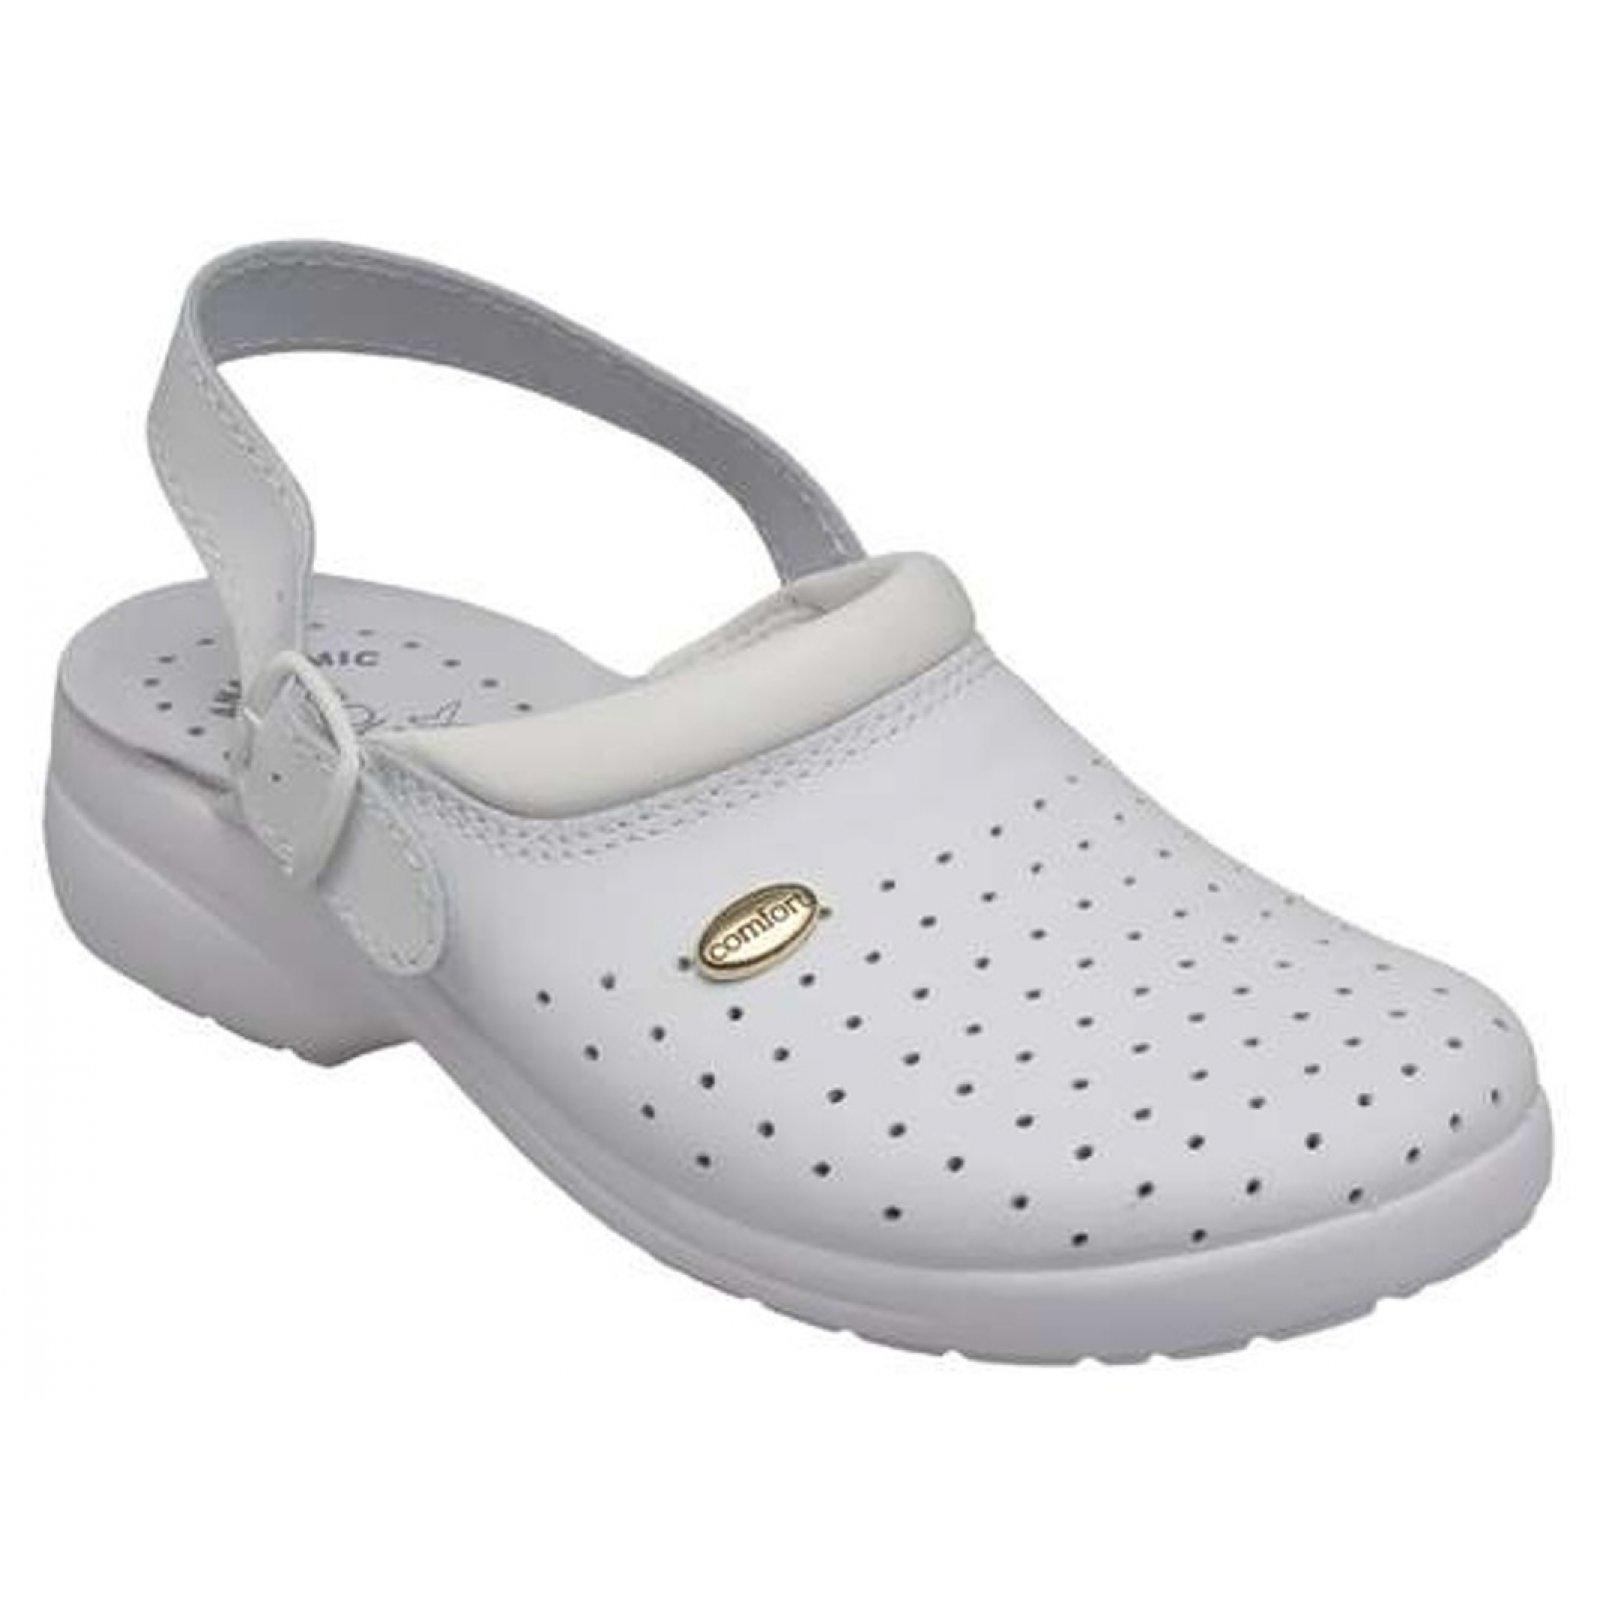 a39bde4115c8 dámské sandály Santé GF 516P bílé - KARS